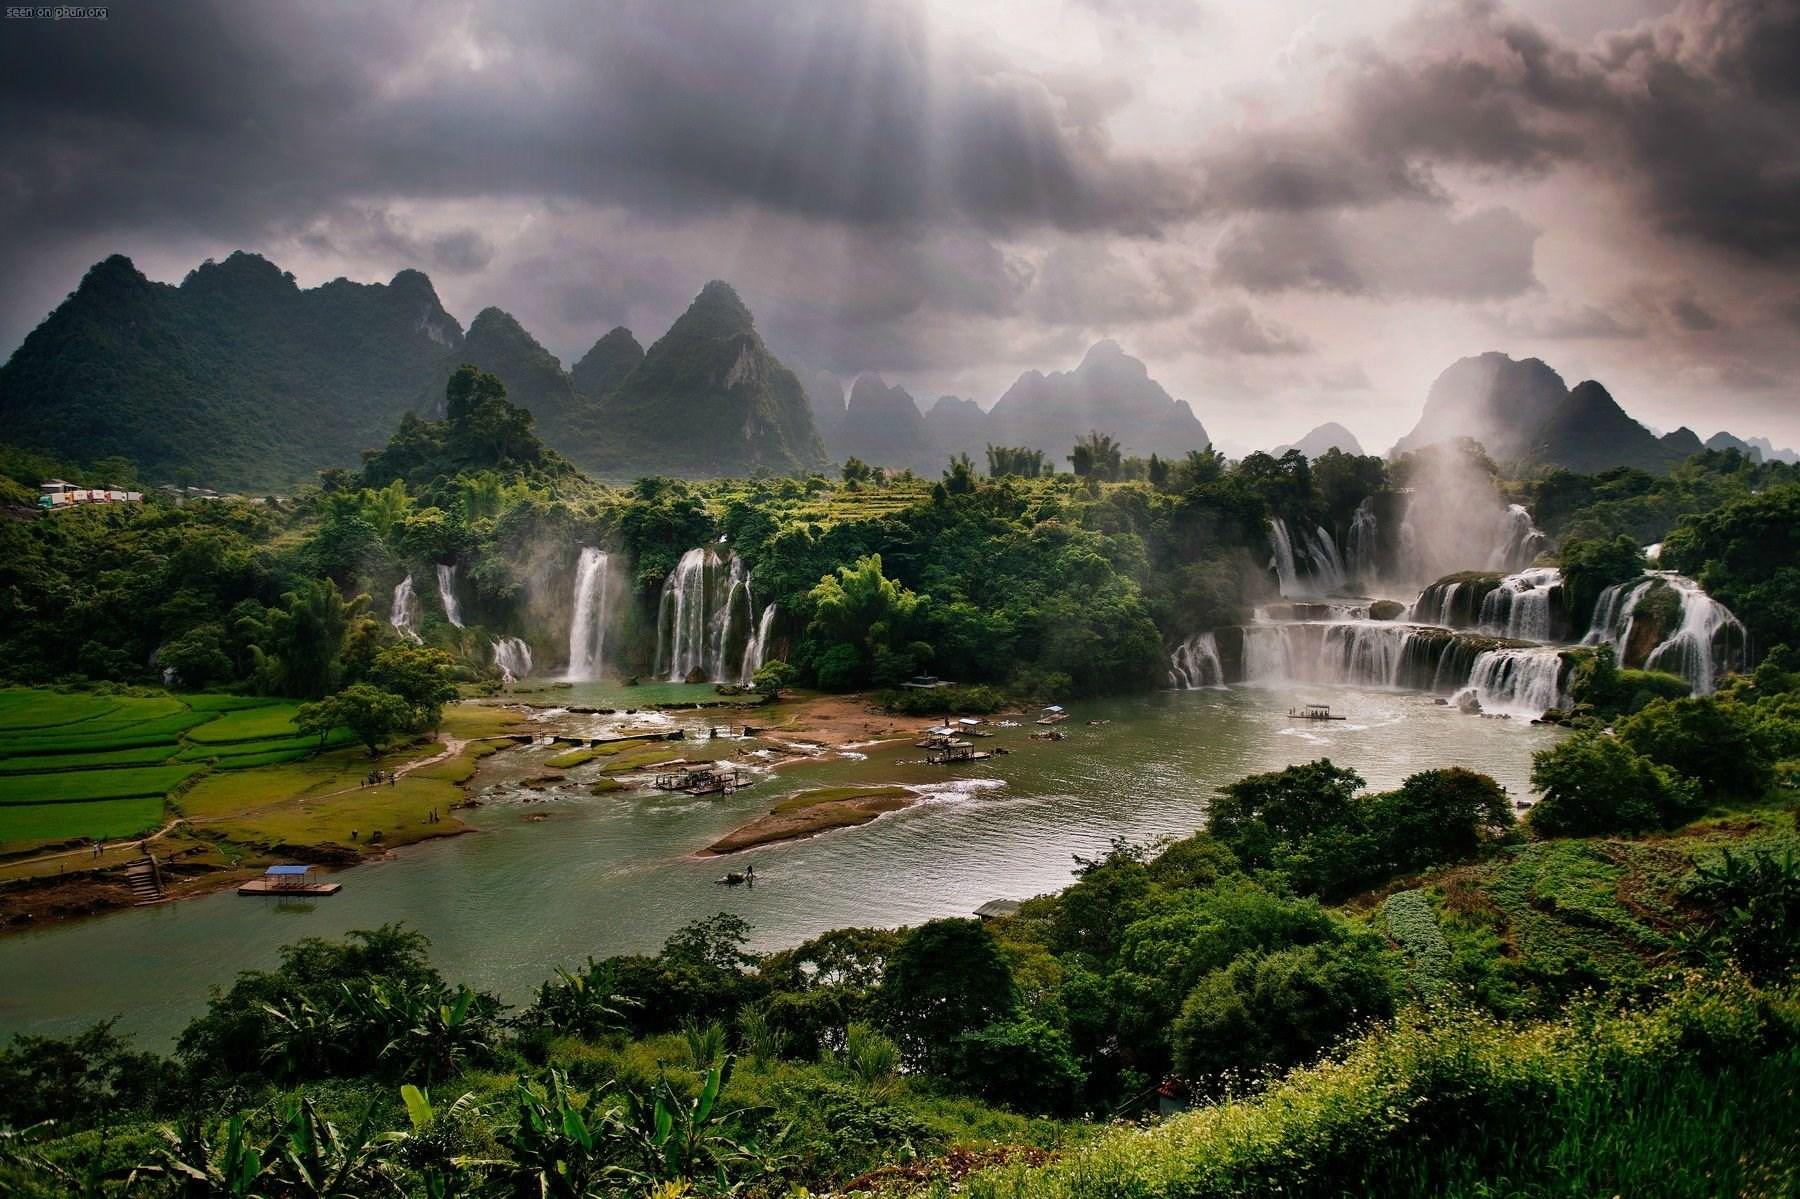 waterfalls images